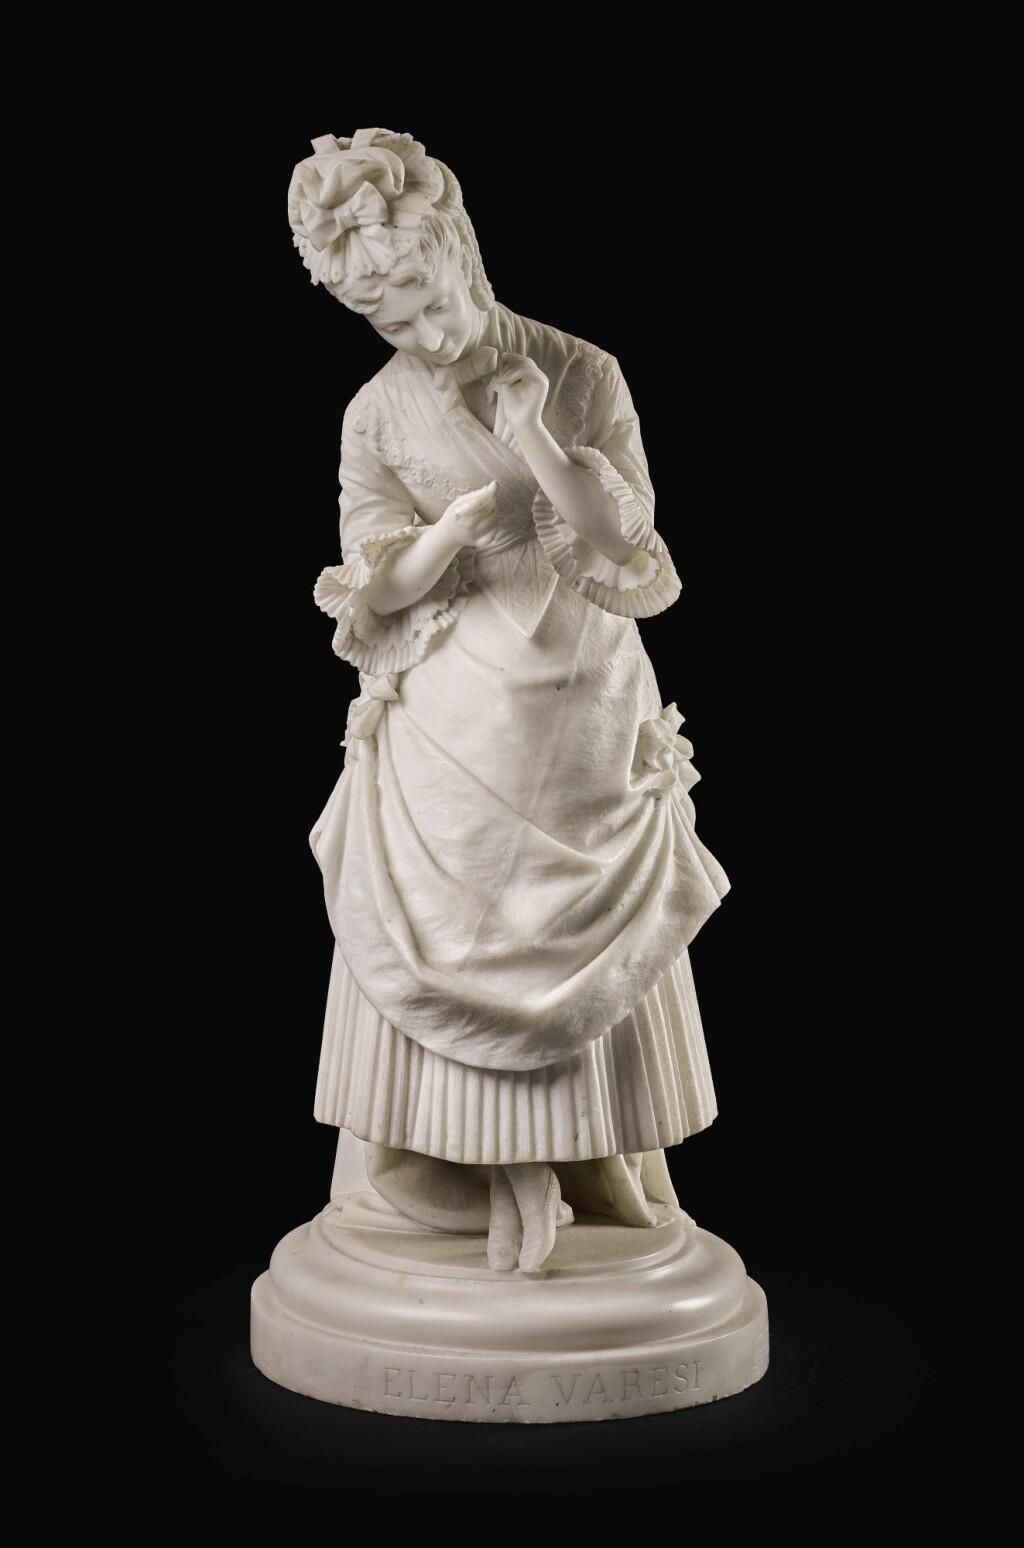 ETTORE XIMENES | PORTRAIT OF ELENA VARESI (1844-1920)